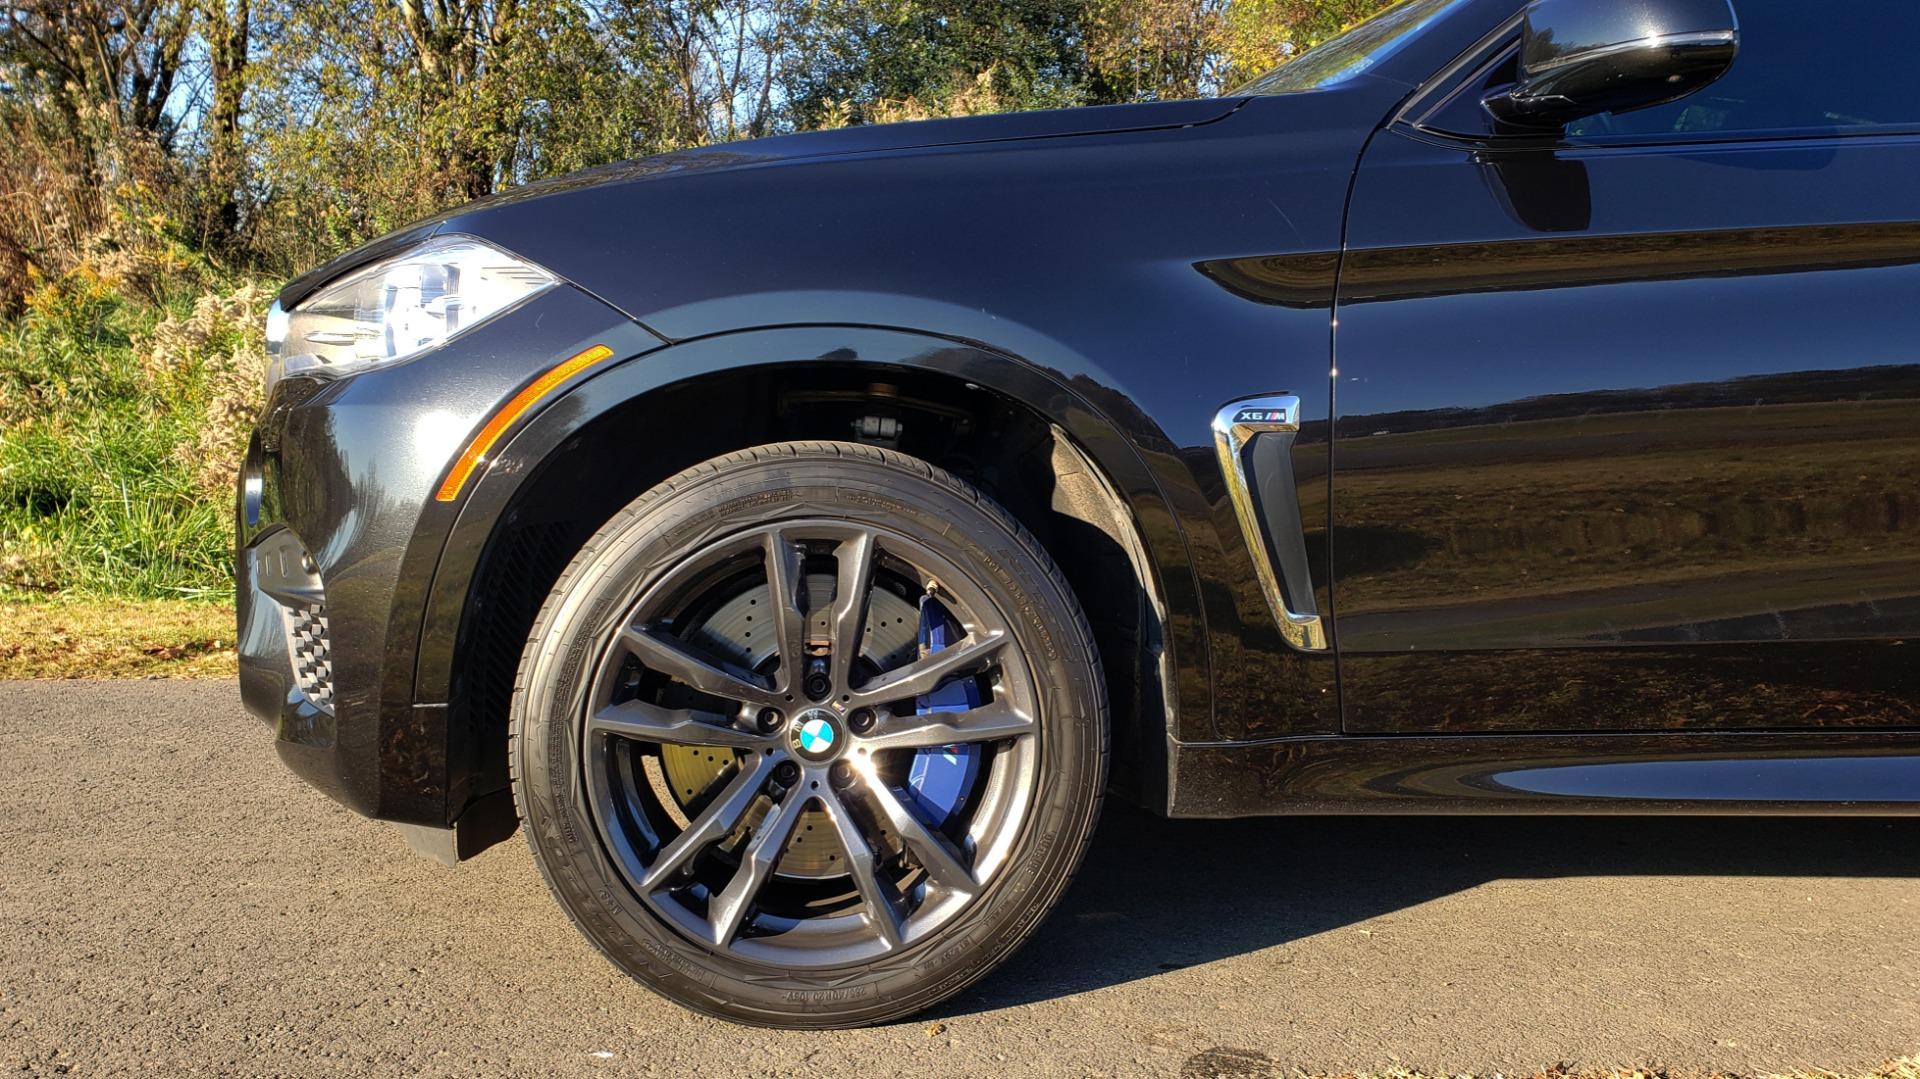 Used 2016 BMW X6 M EXEC PKG / DRVR ASST / NAV / SUNROOF / BLIND SPOT / REARVIEW for sale Sold at Formula Imports in Charlotte NC 28227 87